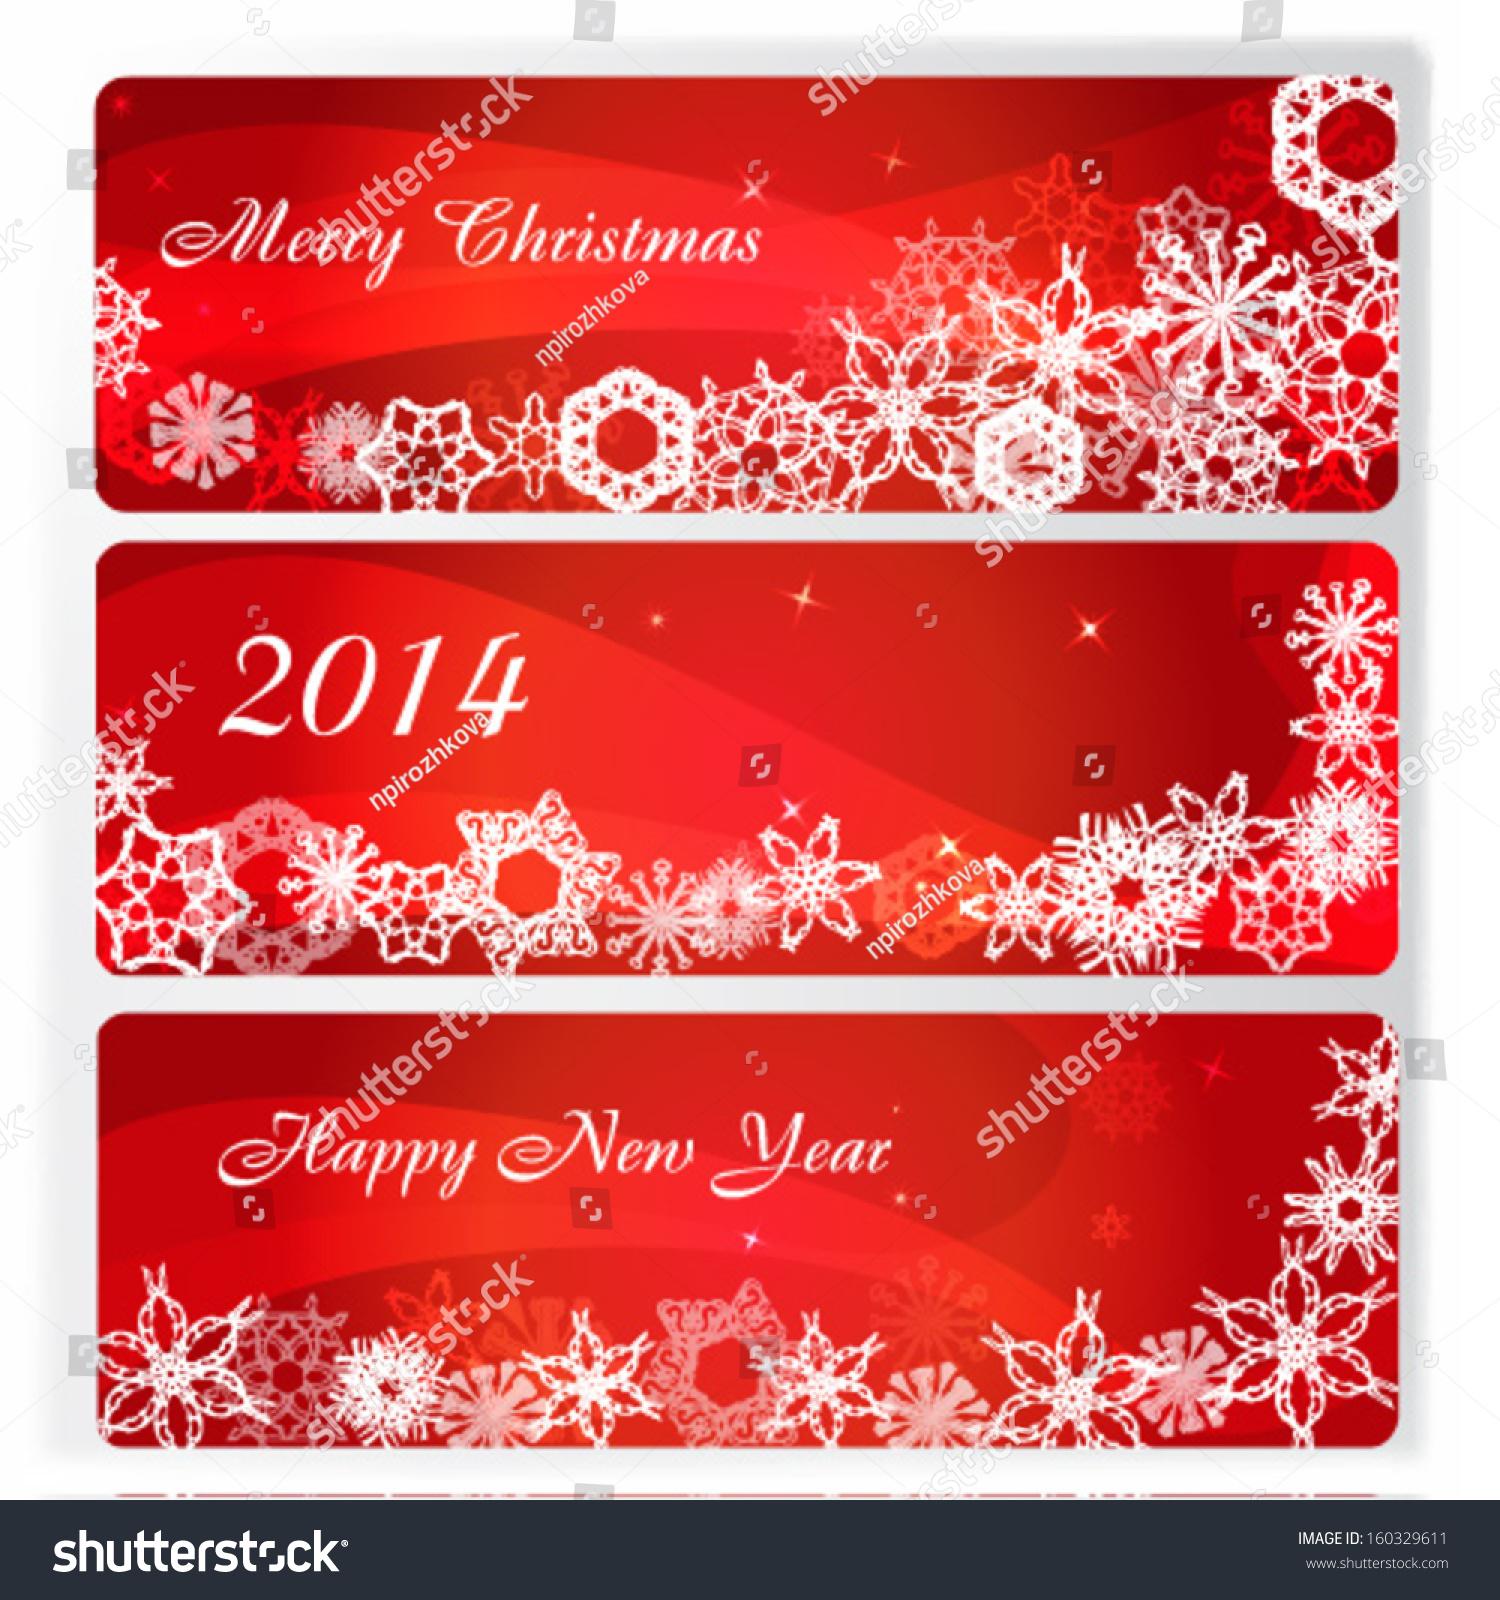 Merry Christmas Headings Stock Vector Bright Elegant Banner Winter Snowflake Christmas